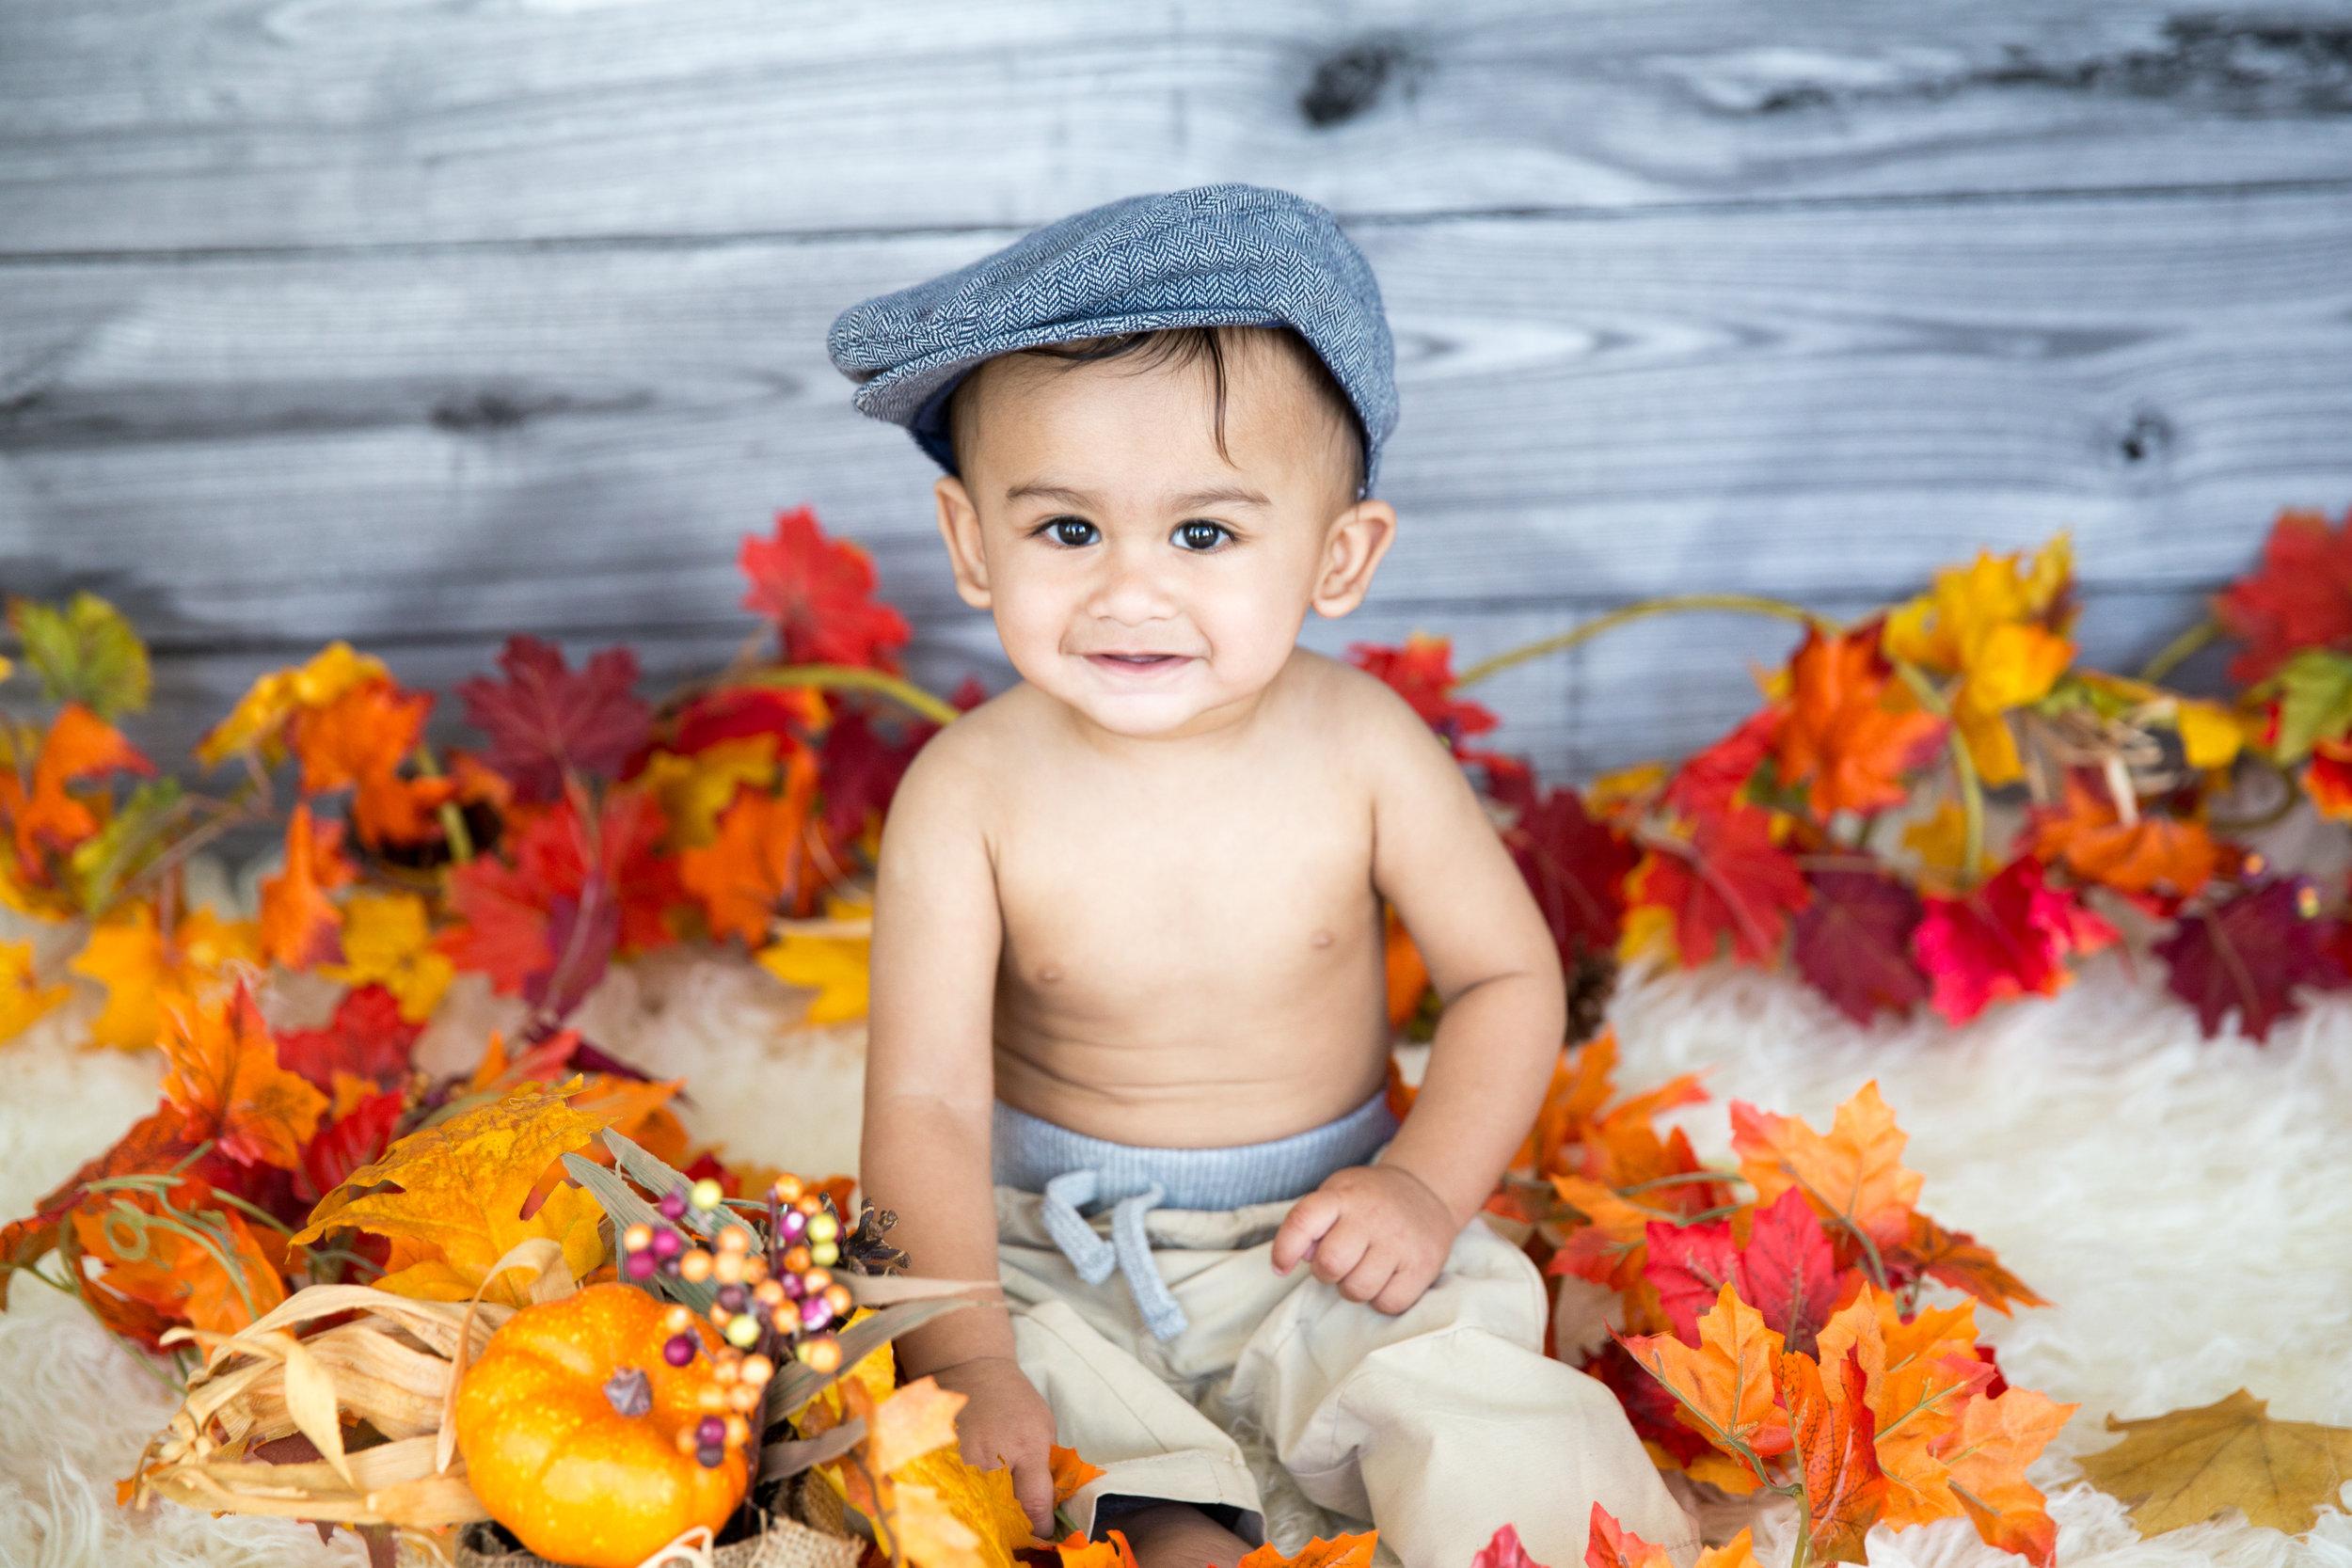 Baby Milestone, Sitter Session - Calgary Photographer